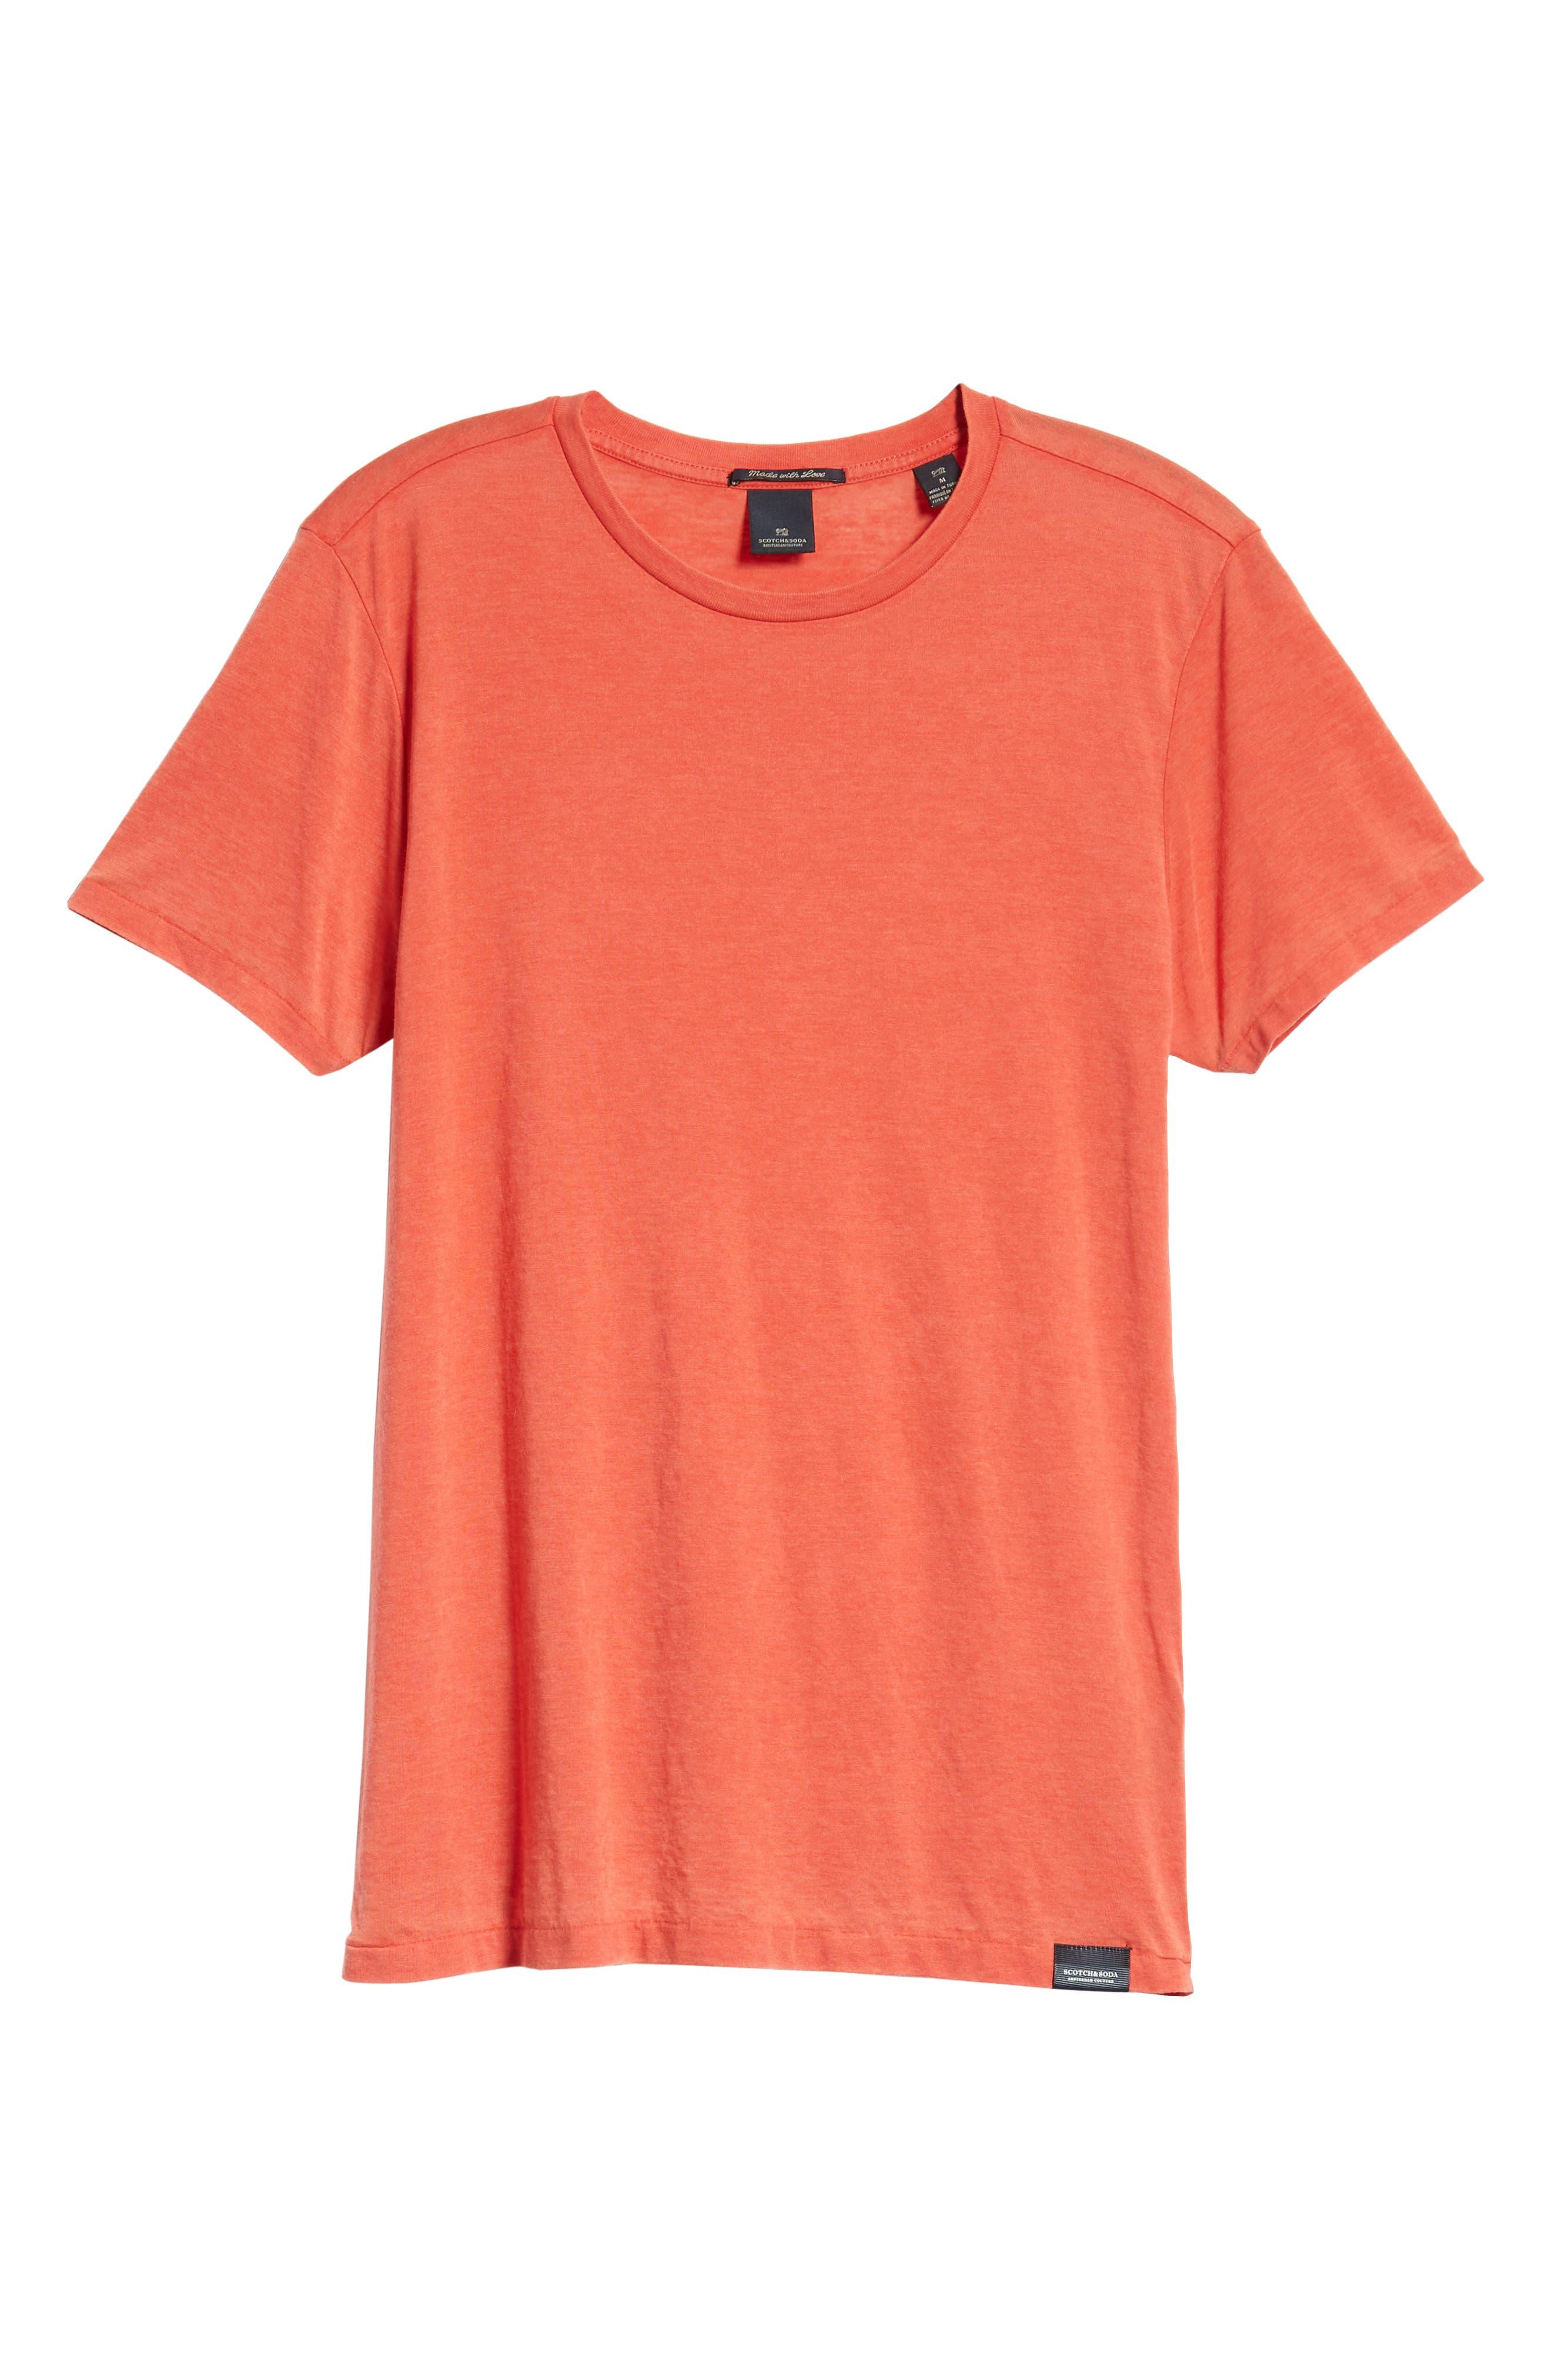 Burnout T-Shirt,                             Alternate thumbnail 6, color,                             RED MELANGE